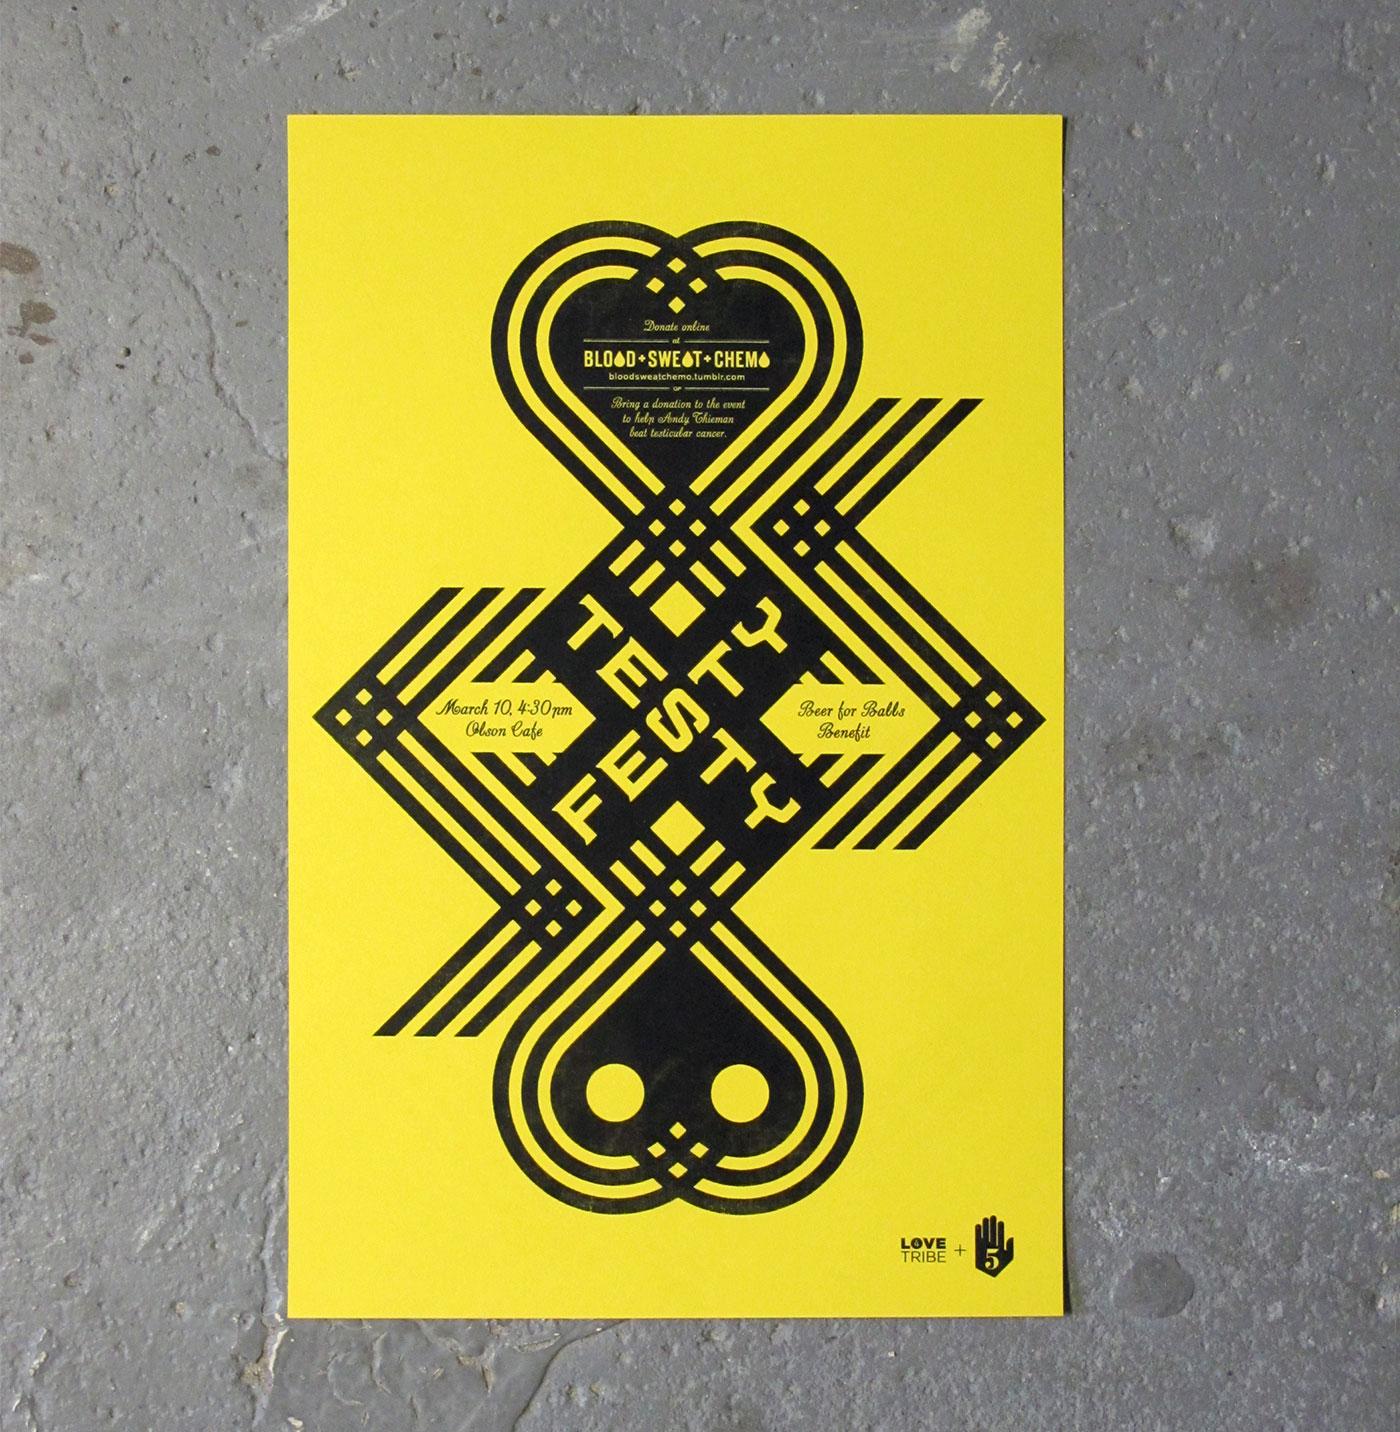 Soulseven_Posters_03.jpg